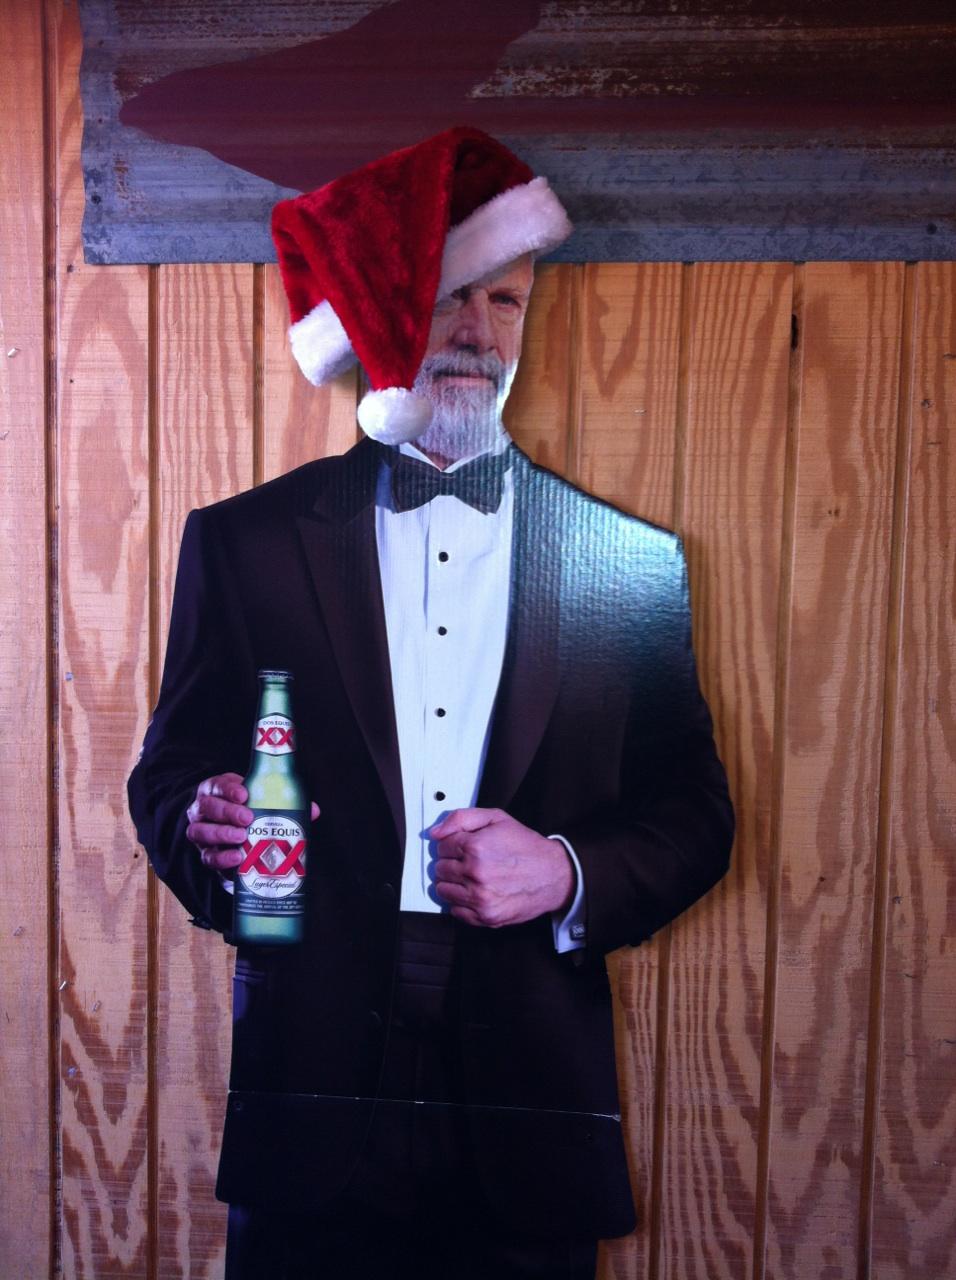 I don't always wear a santa hat...